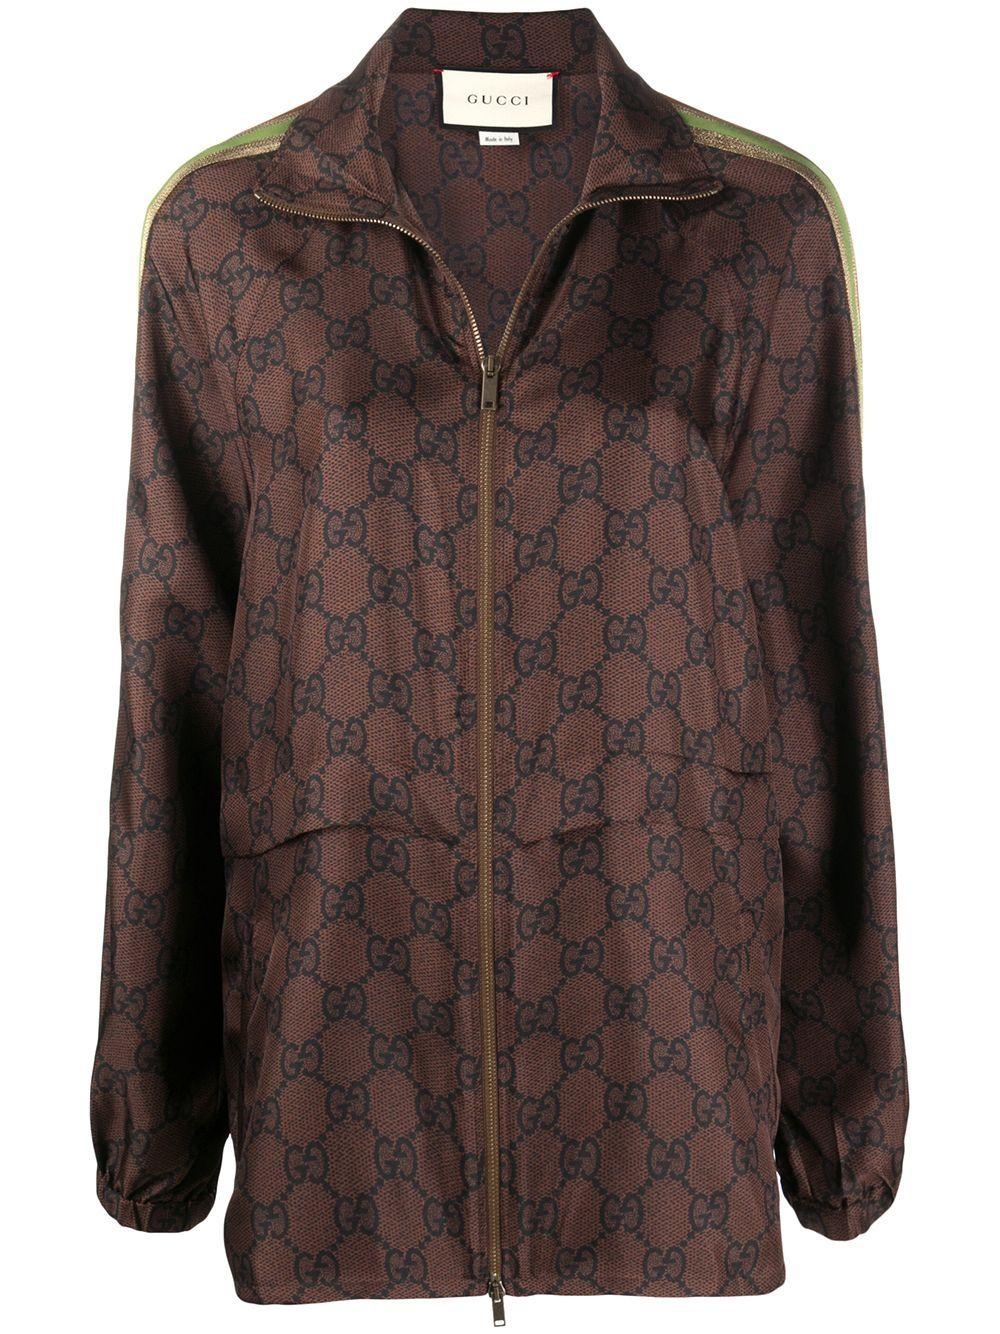 Silk Blend Gg Supreme Jacket